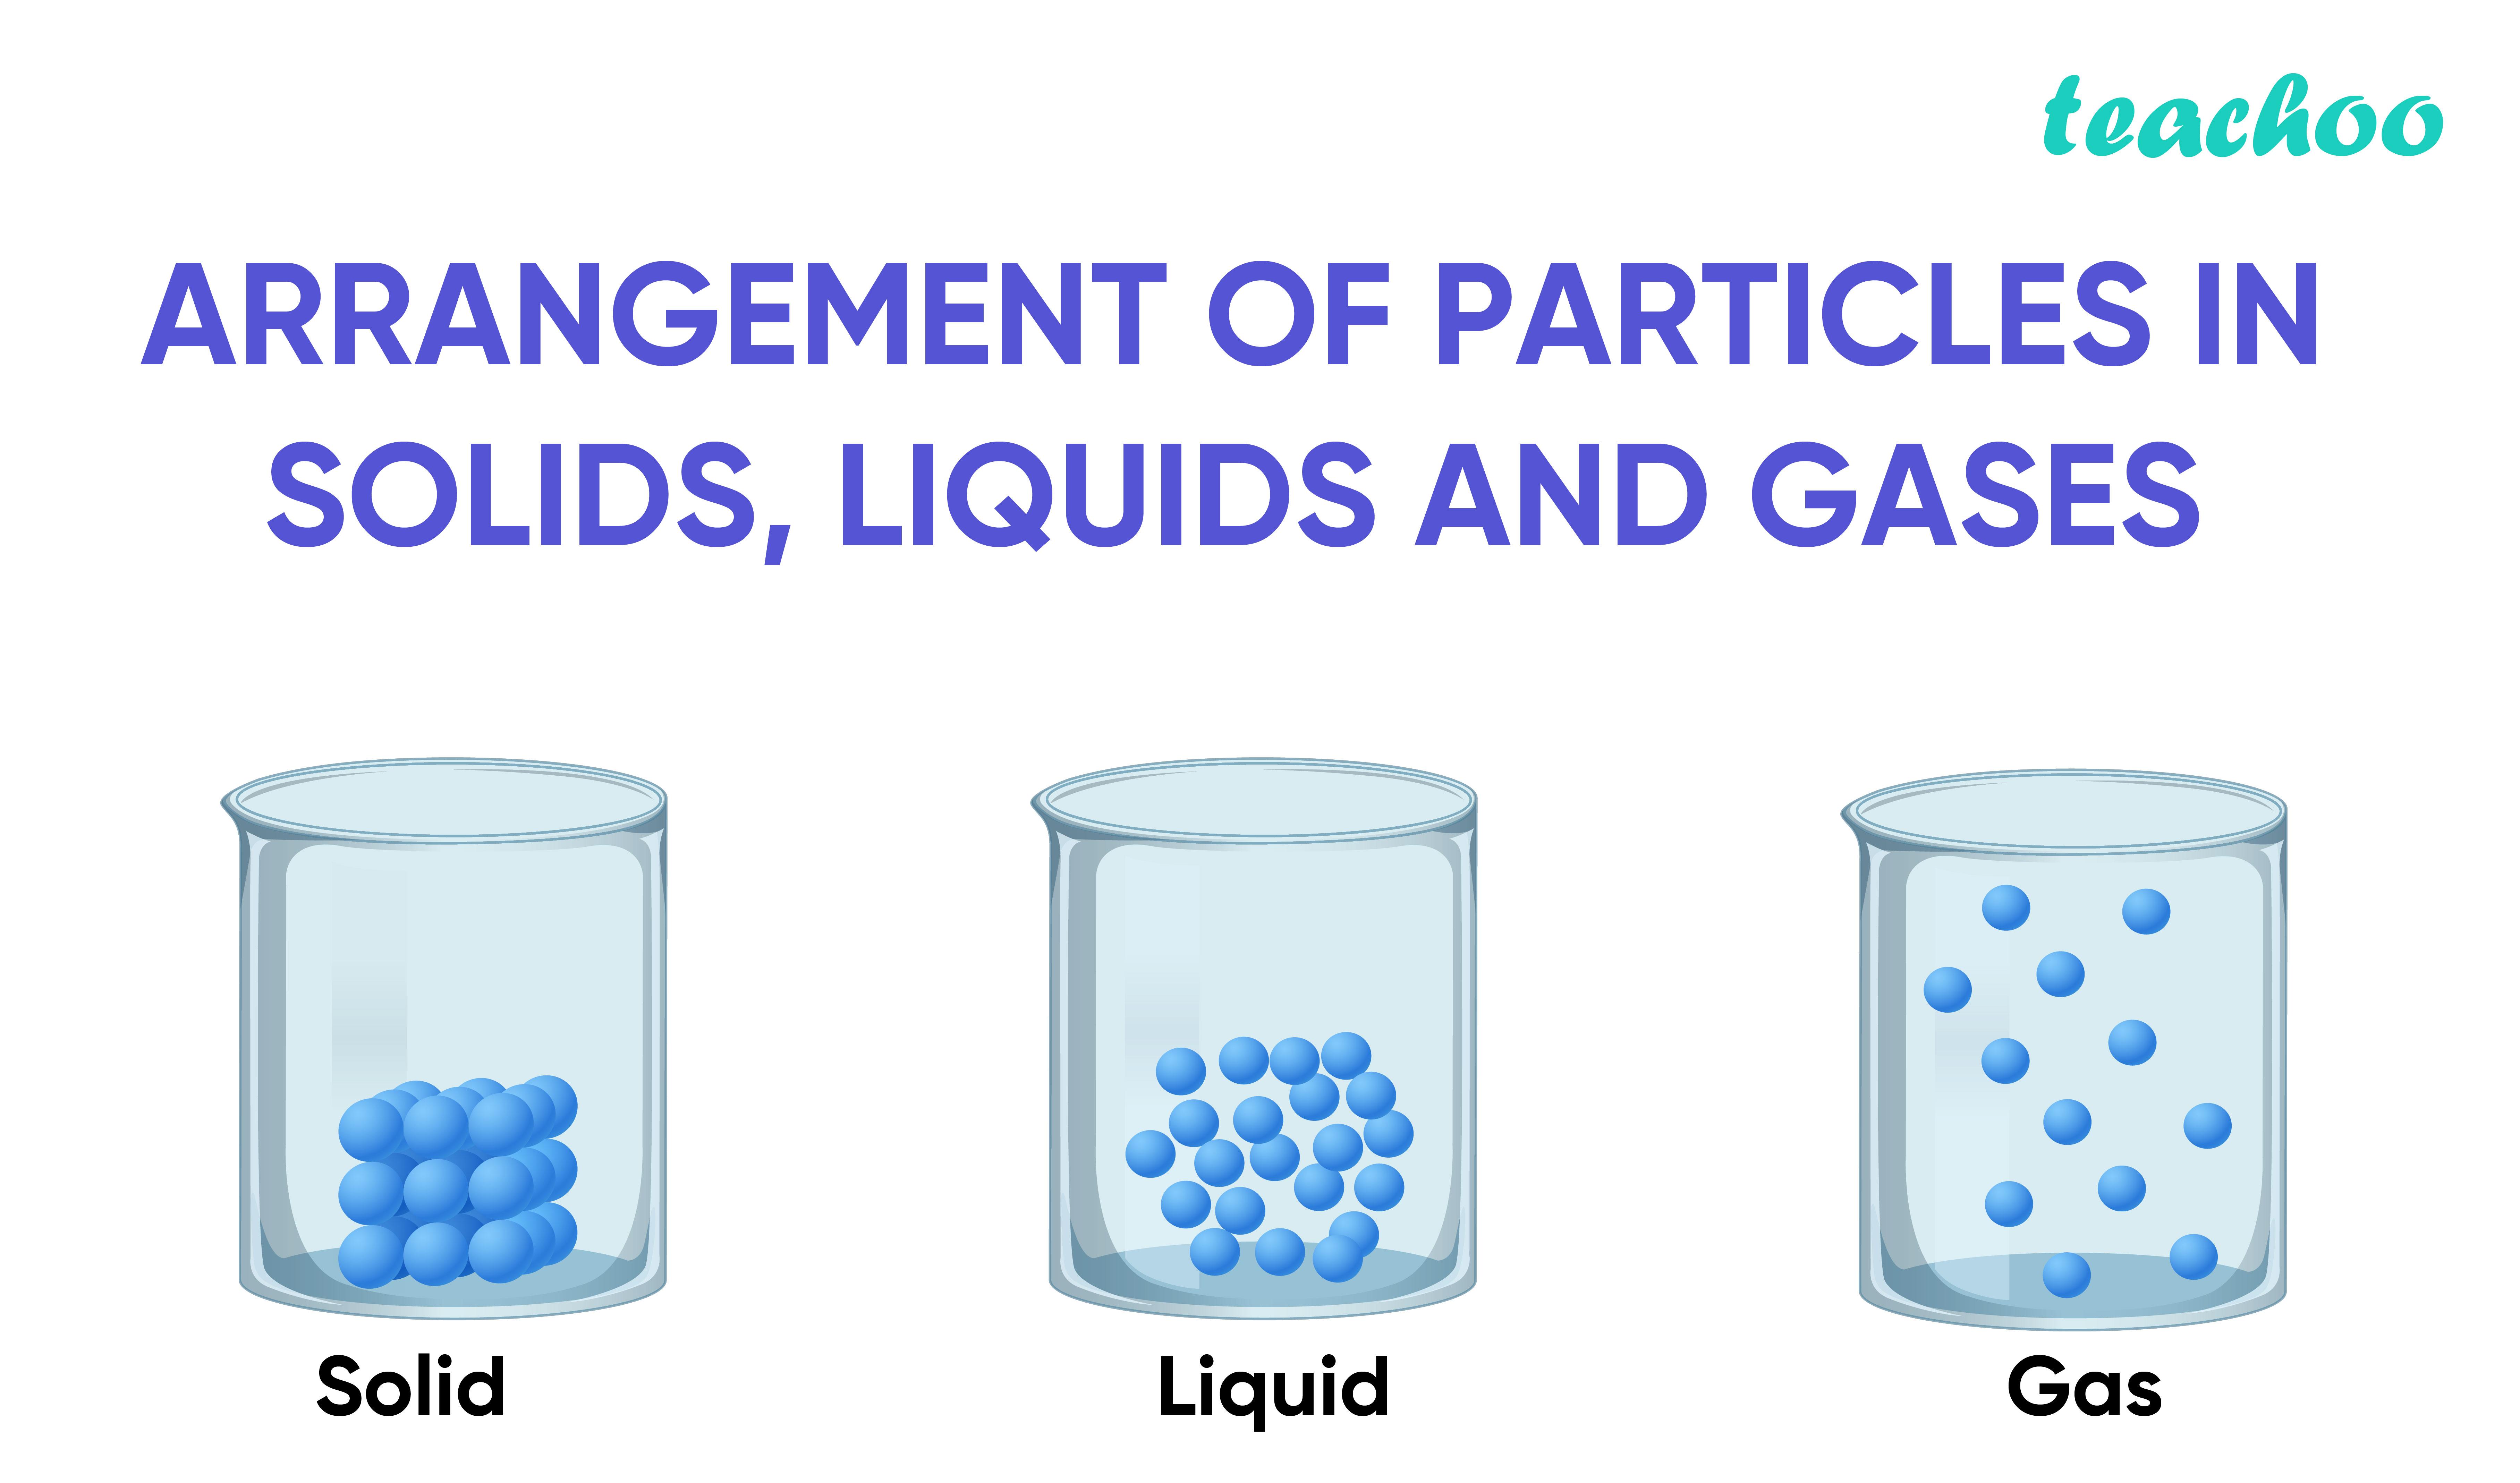 Arrangement of particles in Solids, Liquids and Gases-Teachoo-01.jpg